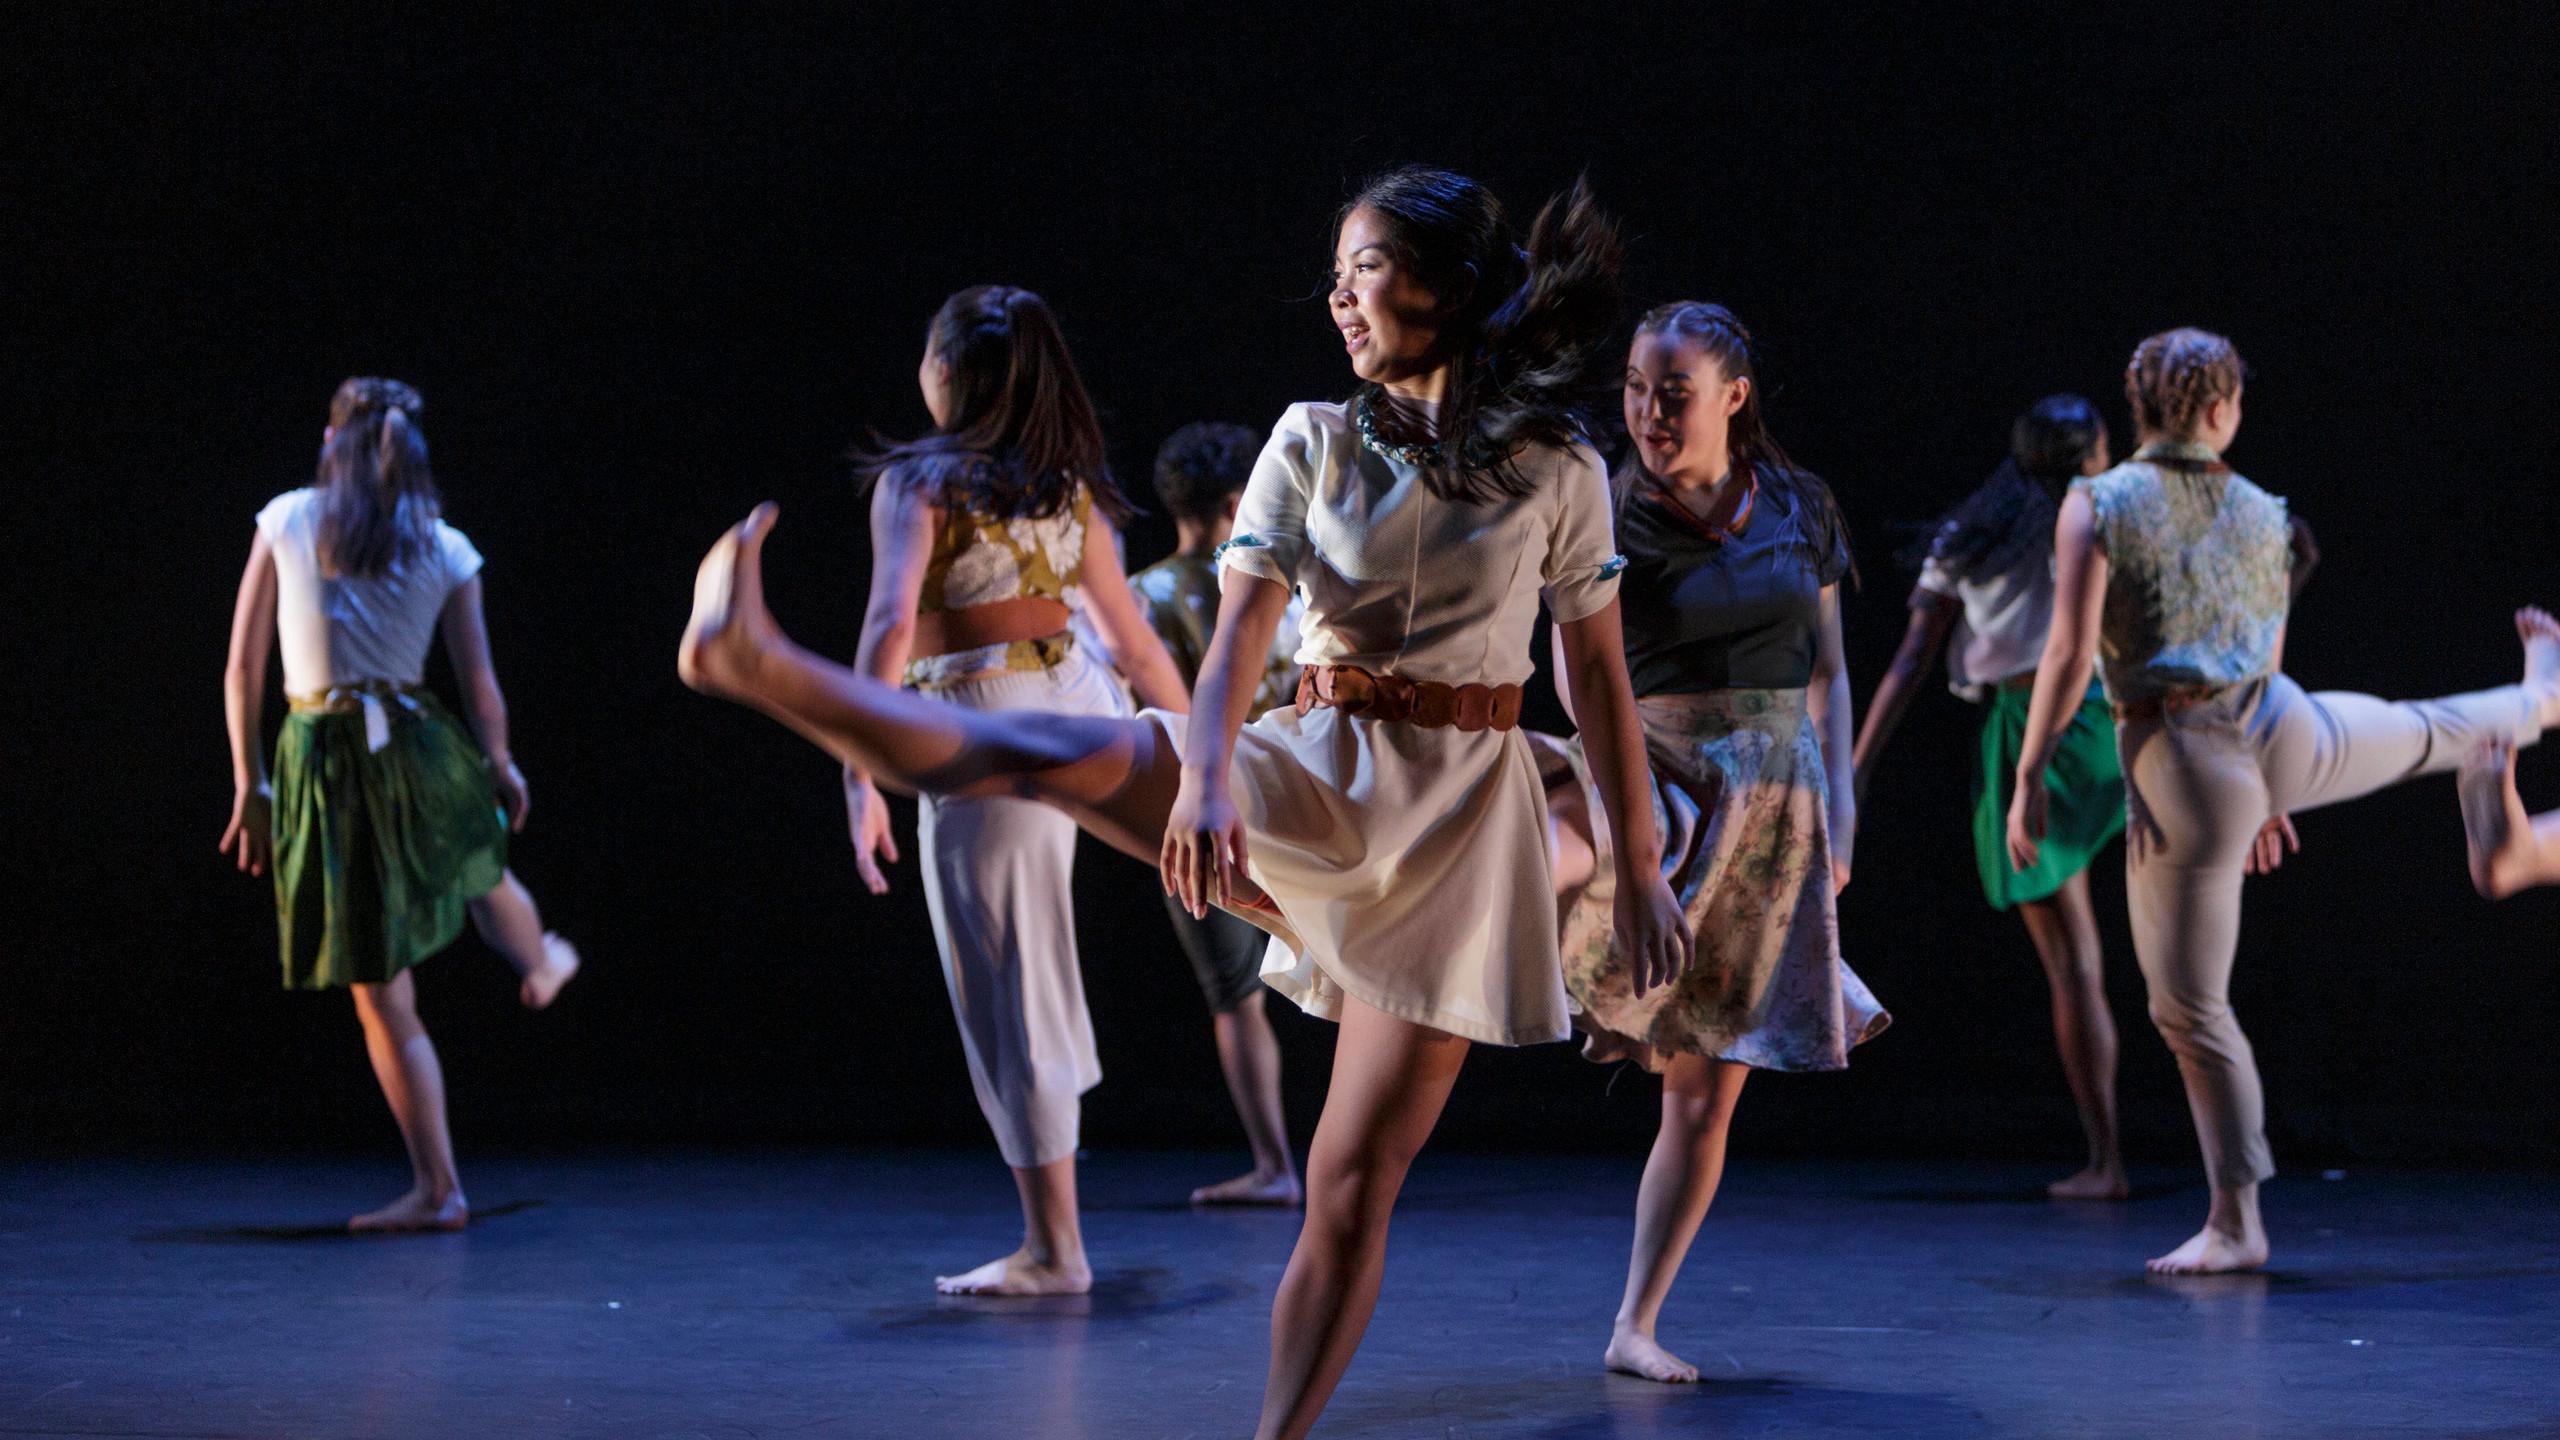 Centre: Soraya Lee Wo and Nikkie Jeong in 'A Day of Light' Choreography by Hanna Kiel